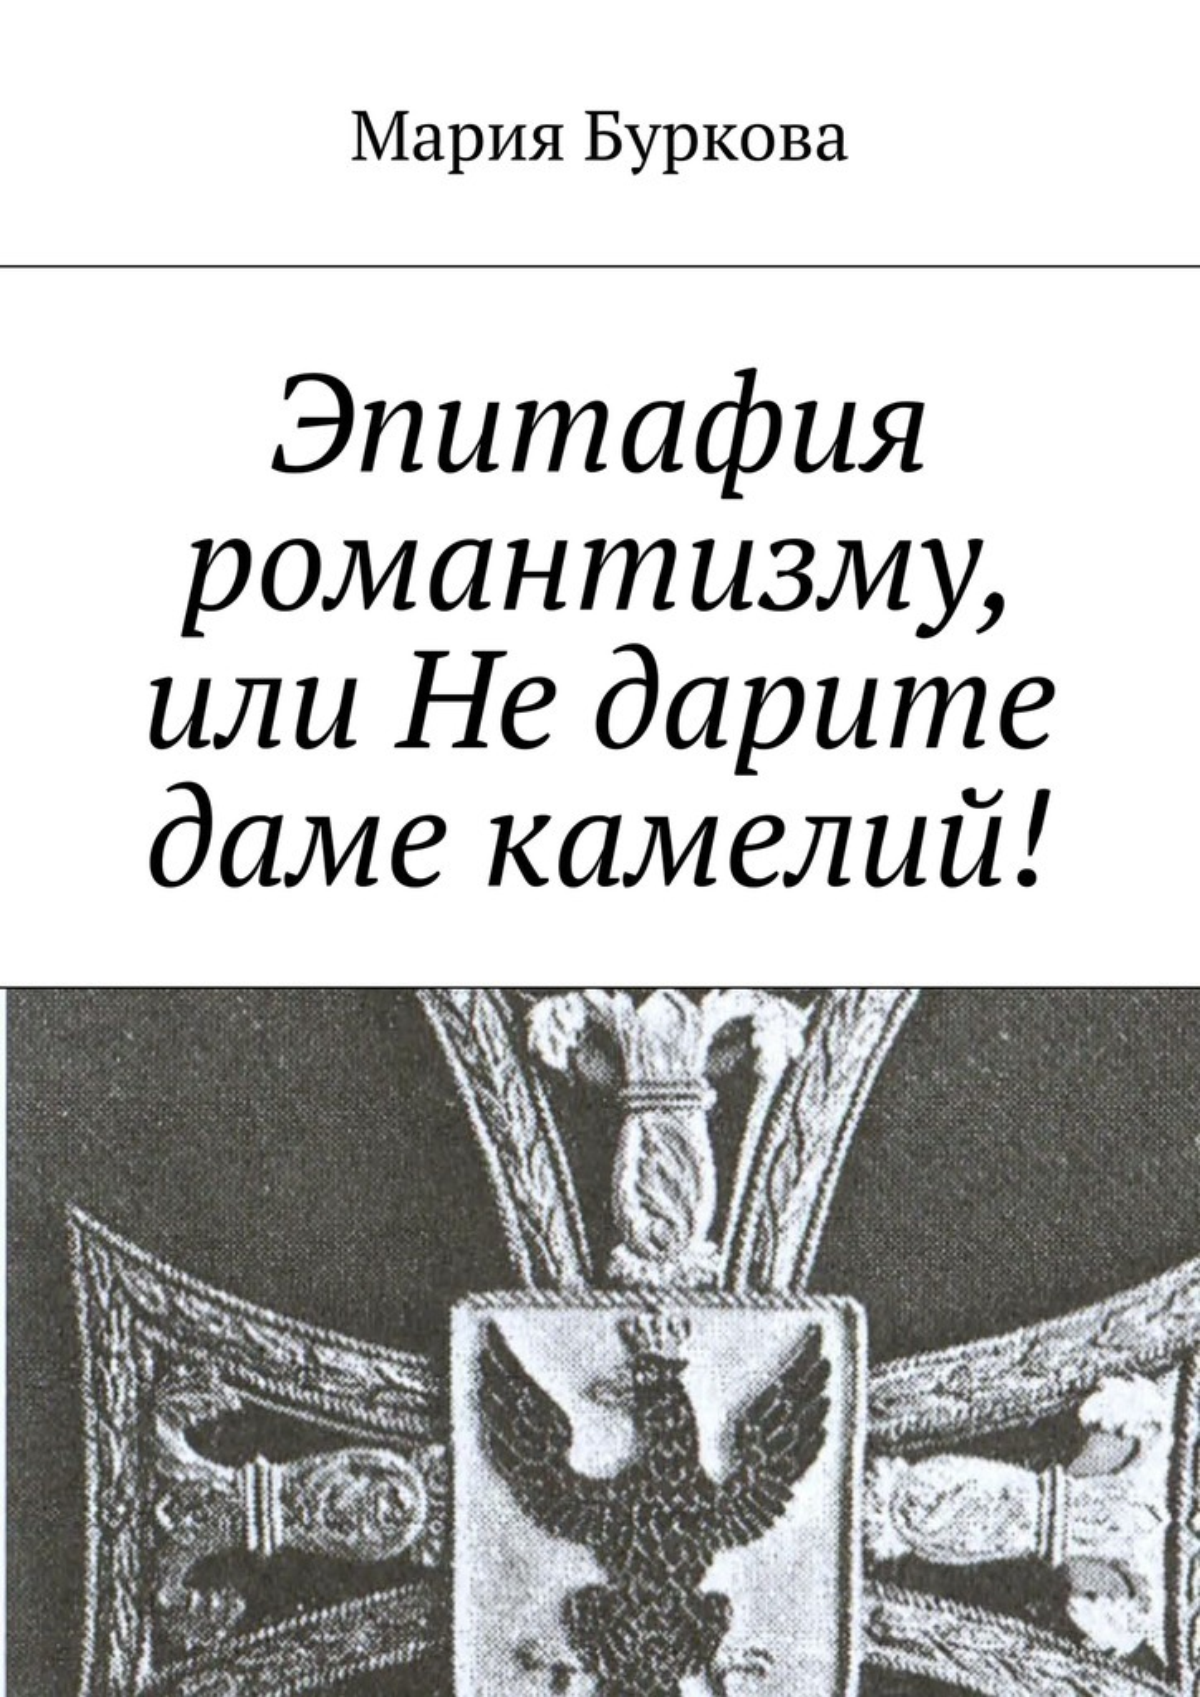 Мария Олеговна Буркова Эпитафия романтизму, или Недарите даме камелий! мария олеговна буркова оструктуре любви